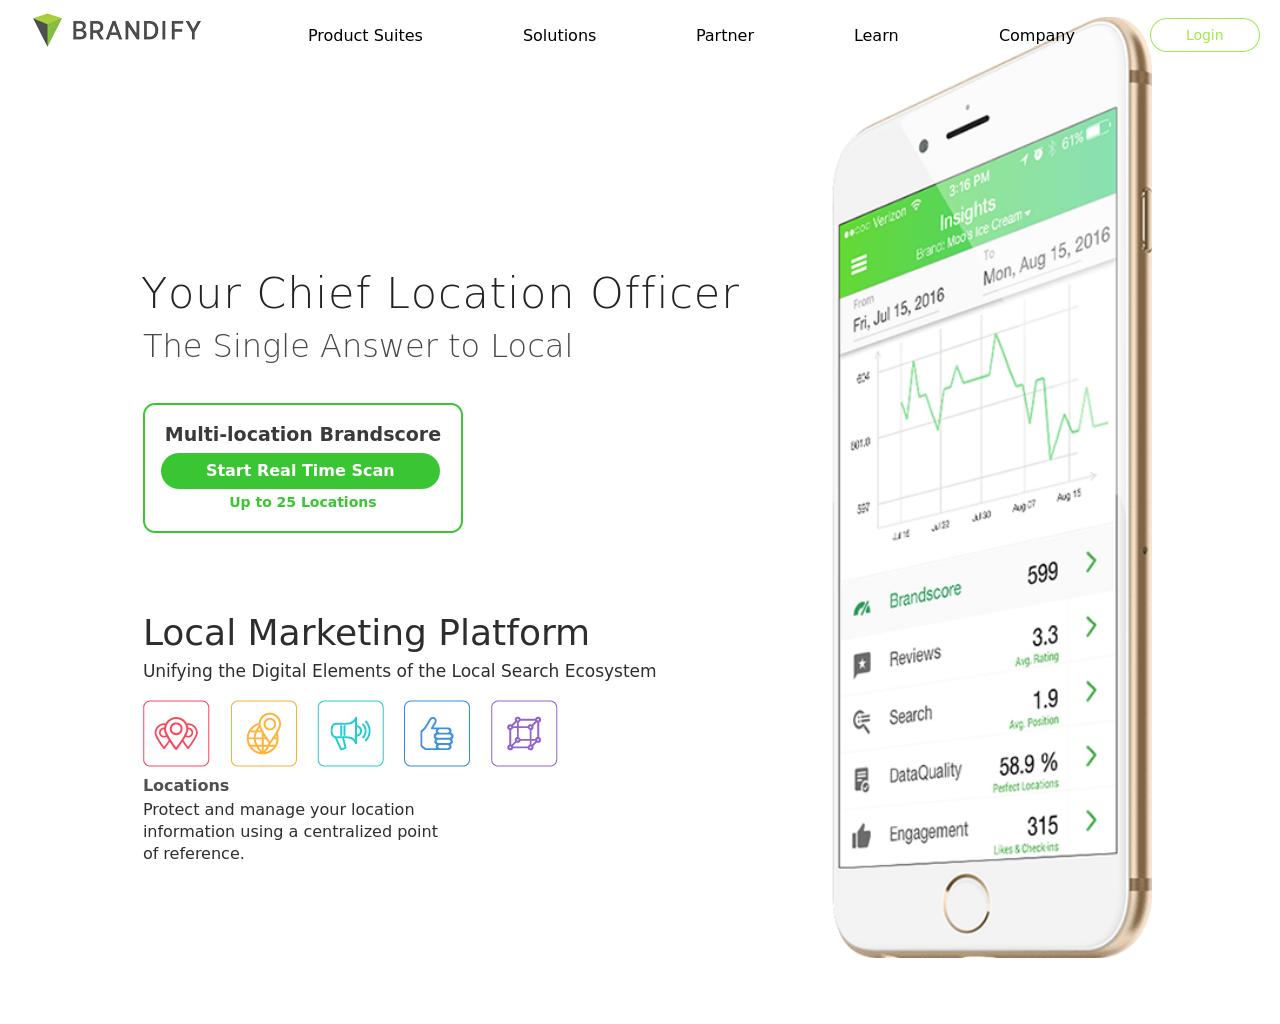 Brandify-Advertising-Reviews-Pricing